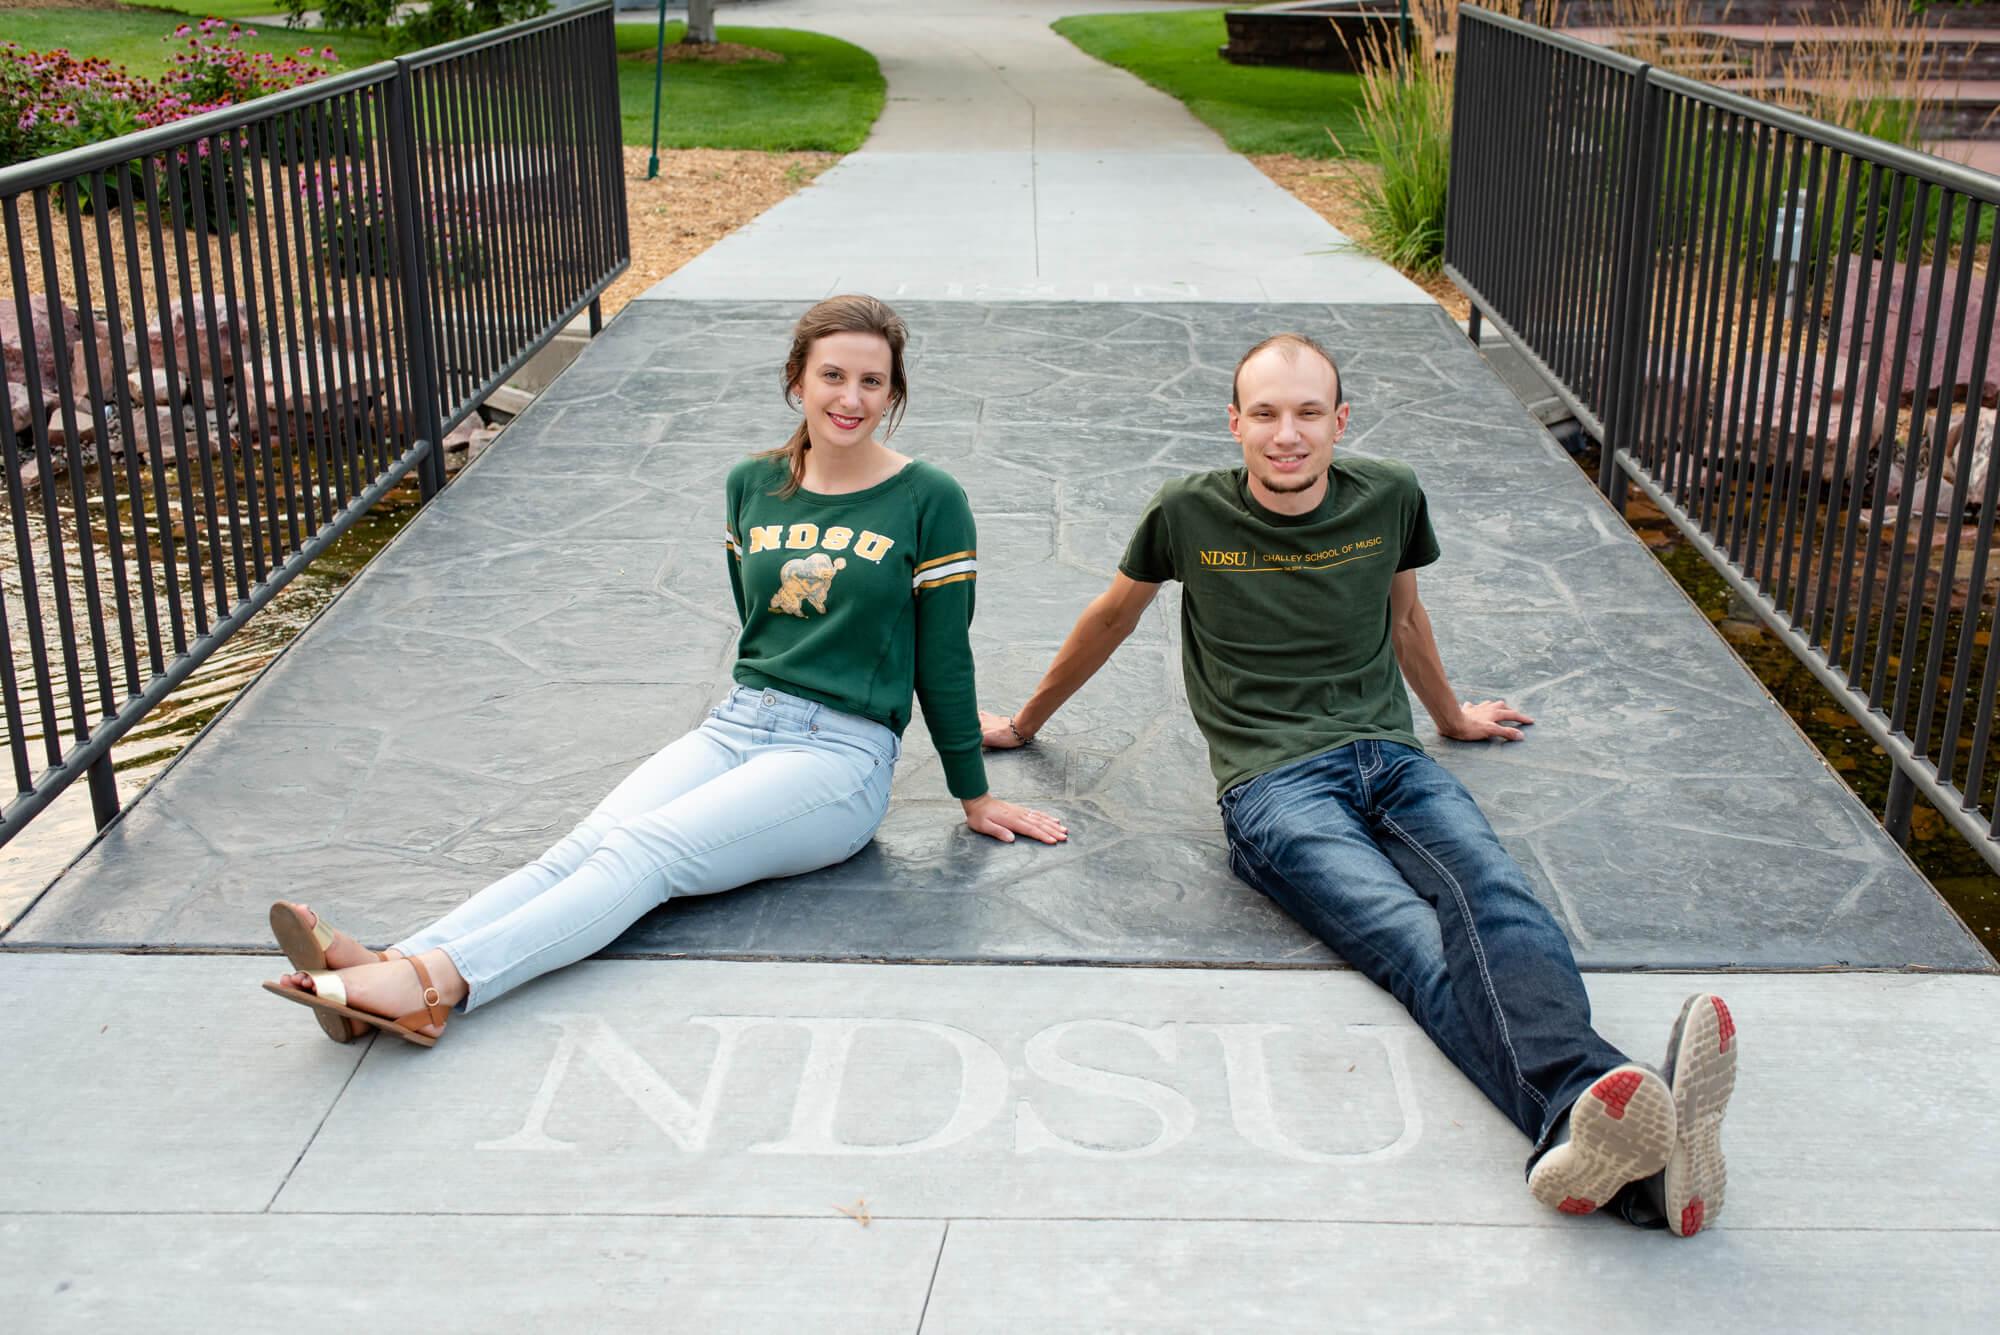 DSC 5215 - John and Faith's Engagement   Fargo, North Dakota